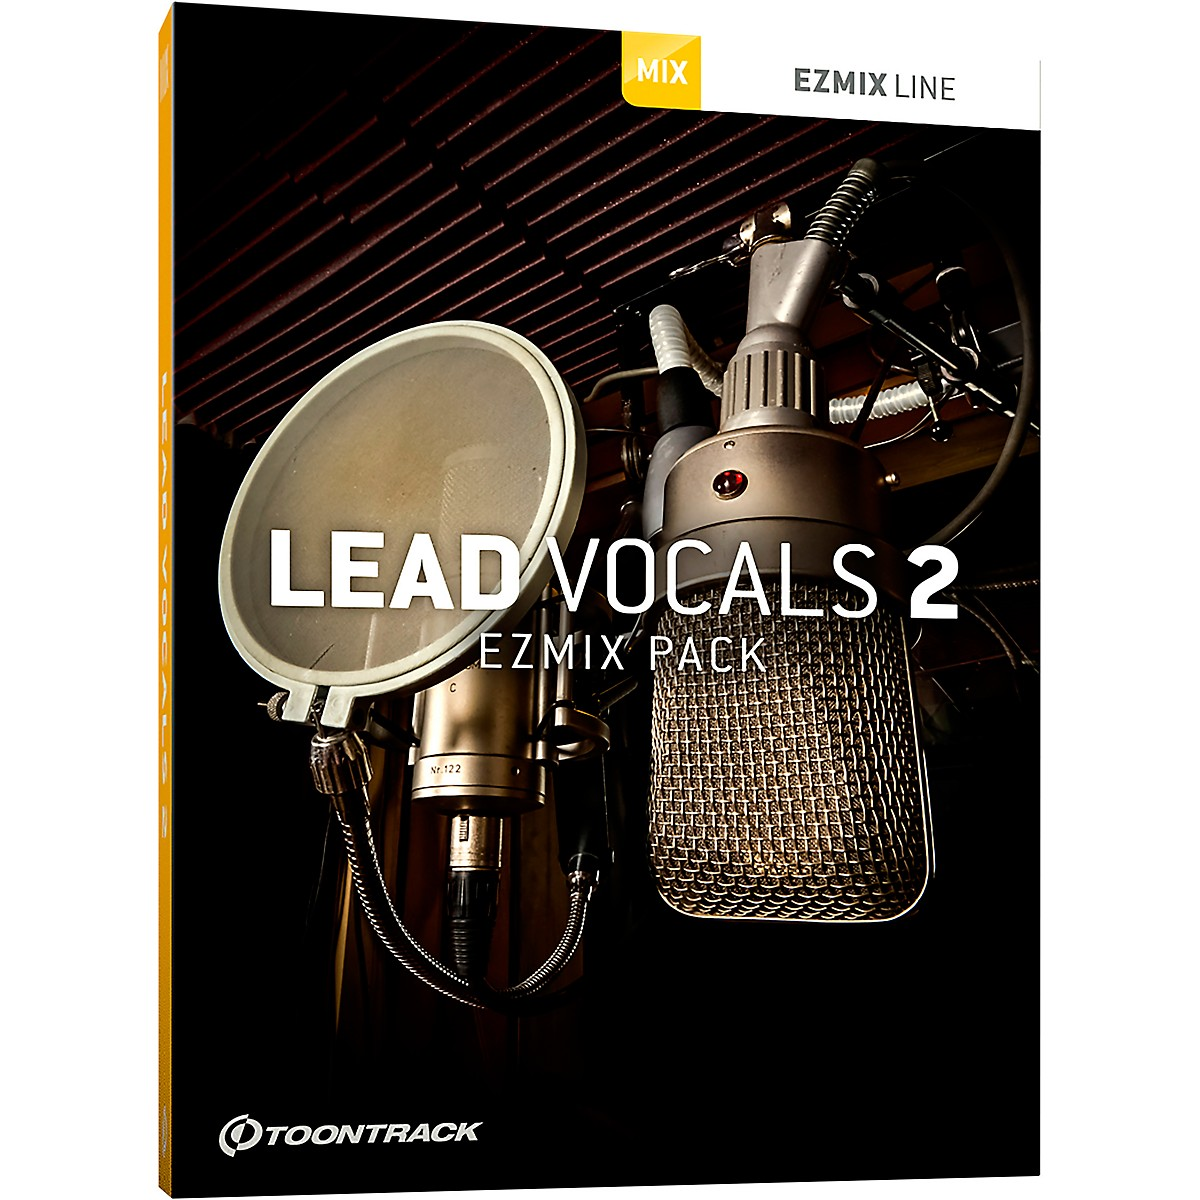 Toontrack Lead Vocals 2 EZMIX Pack